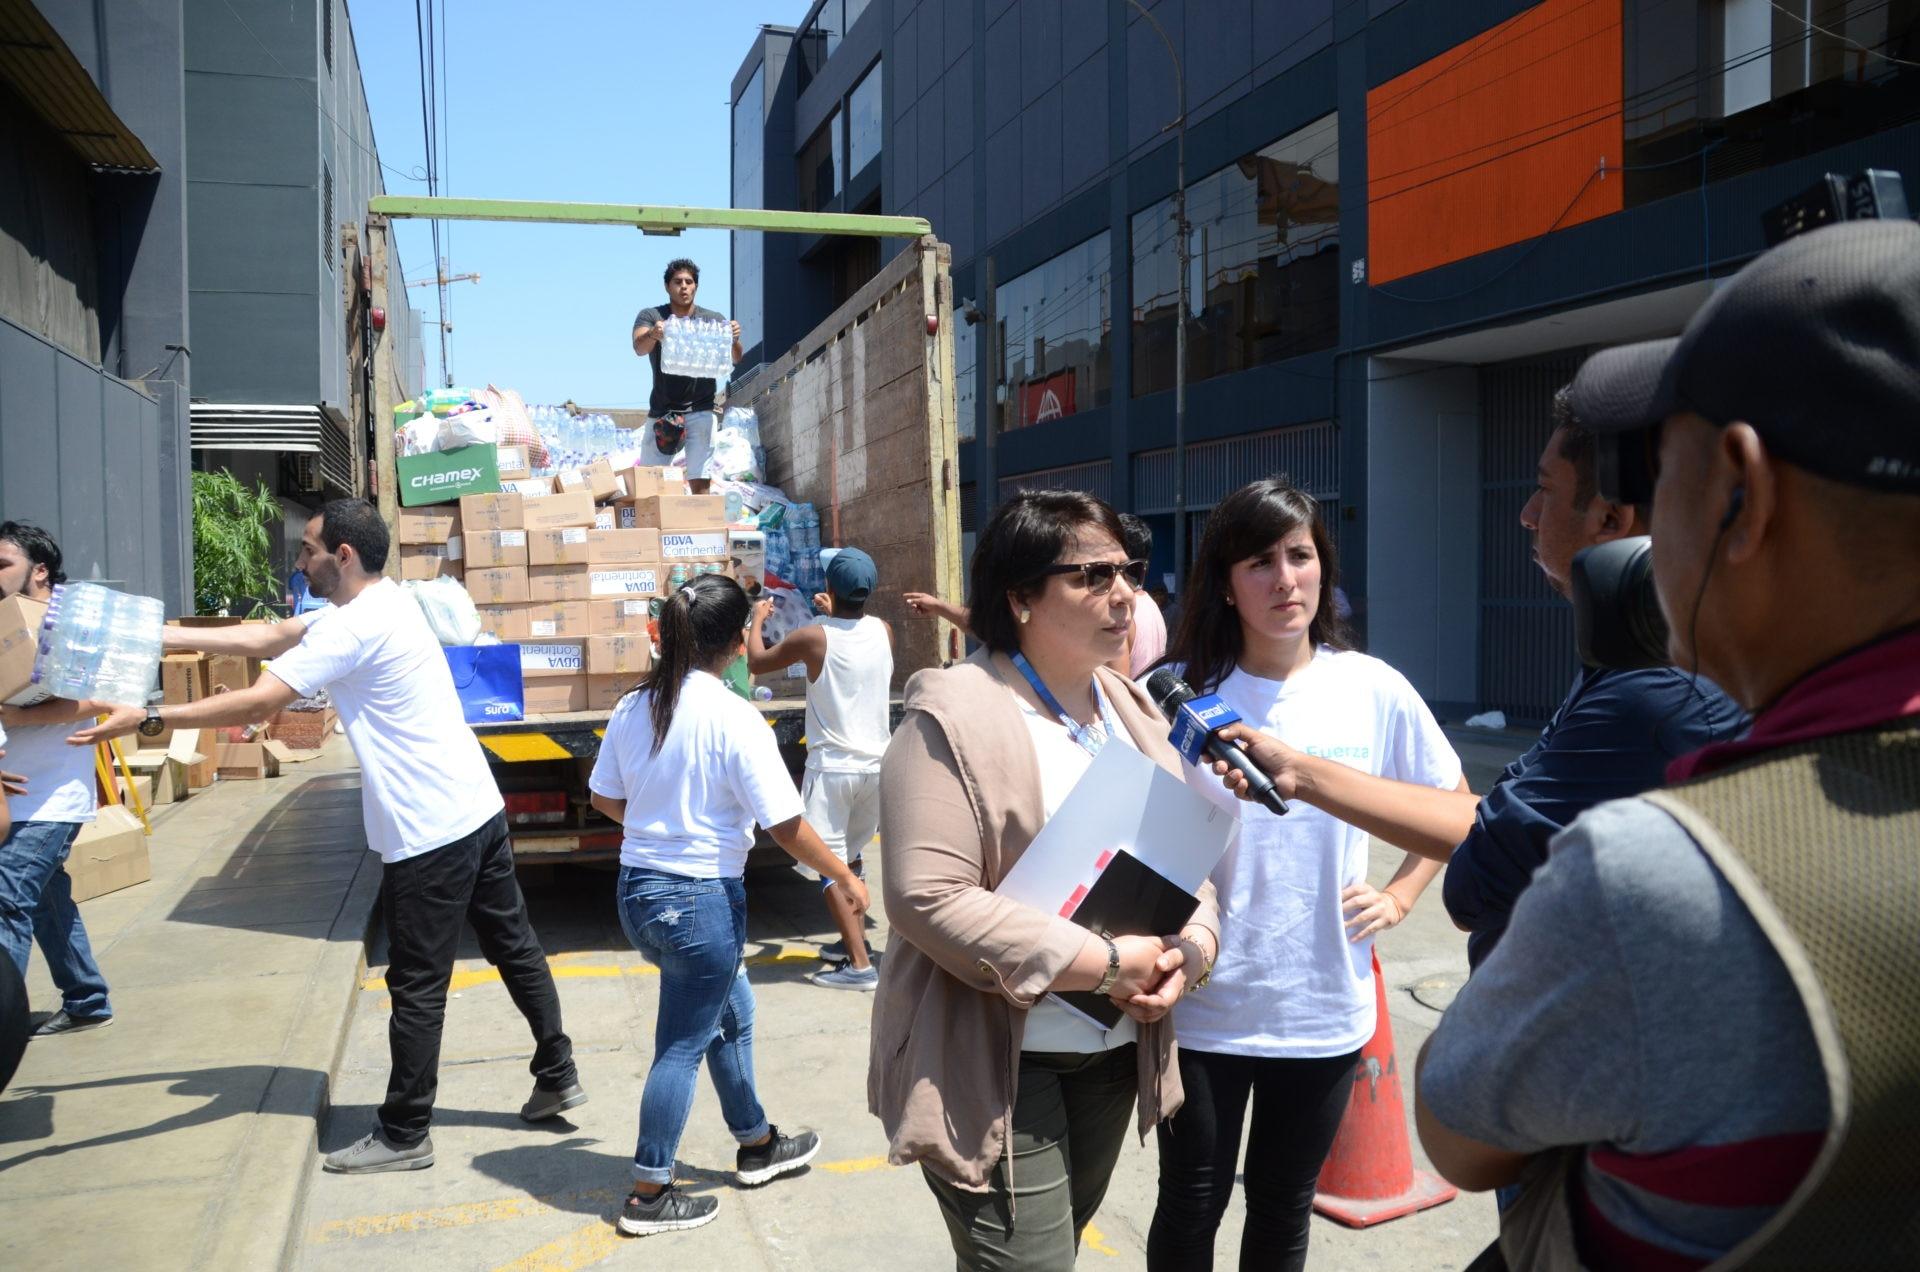 fotografia de inundaciones donaciones peru bbva